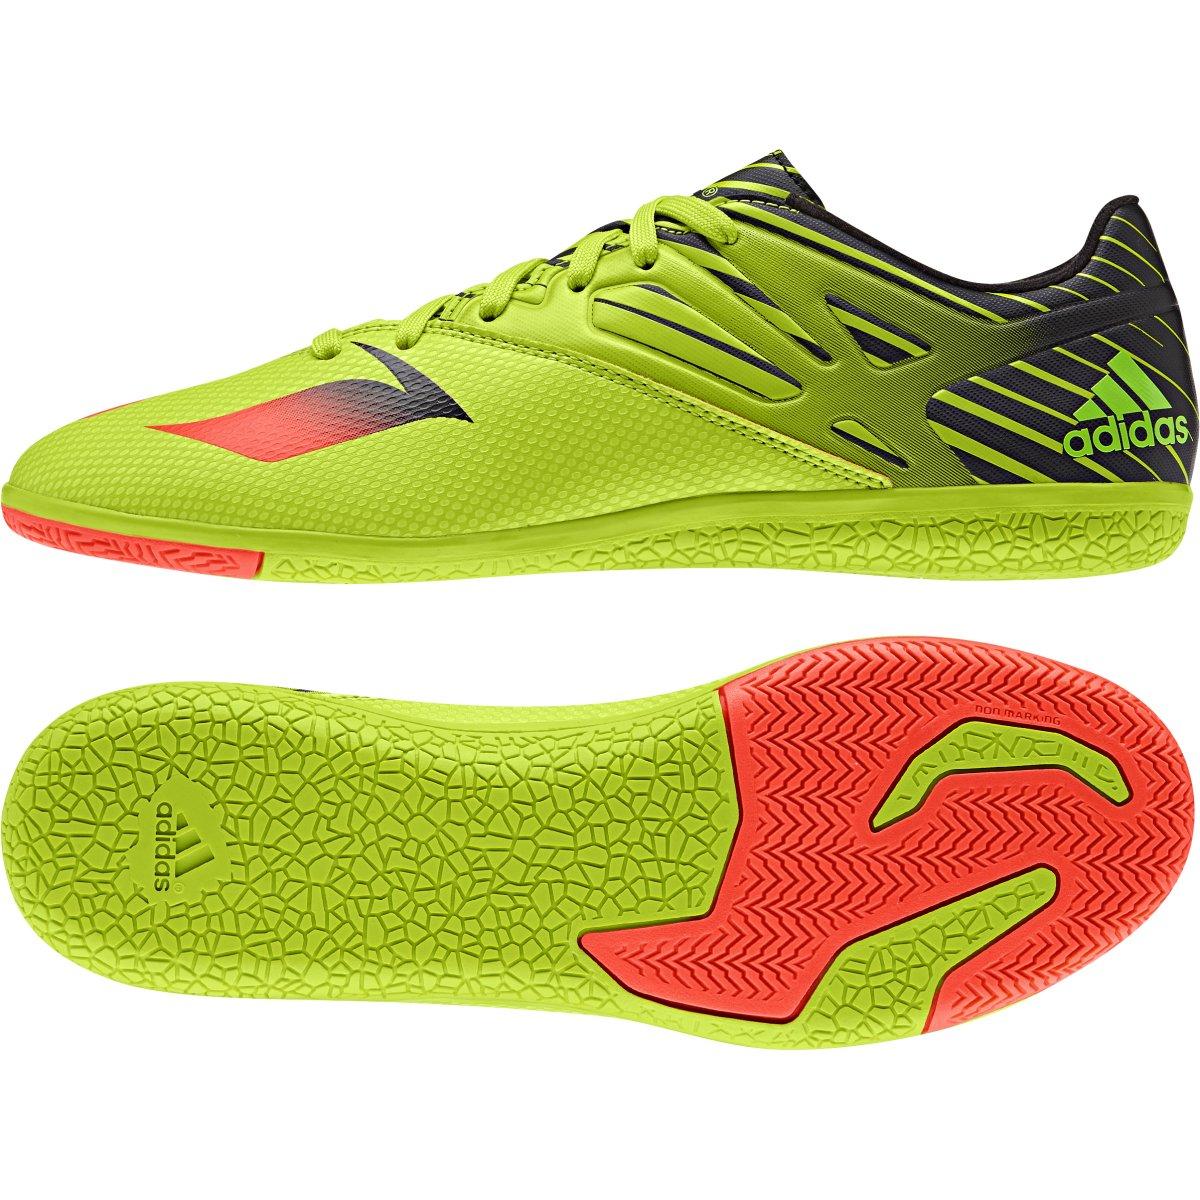 9090e0ff0b Chuteira Futsal Adidas Messi 15.3 IN Masculina - Compre Agora